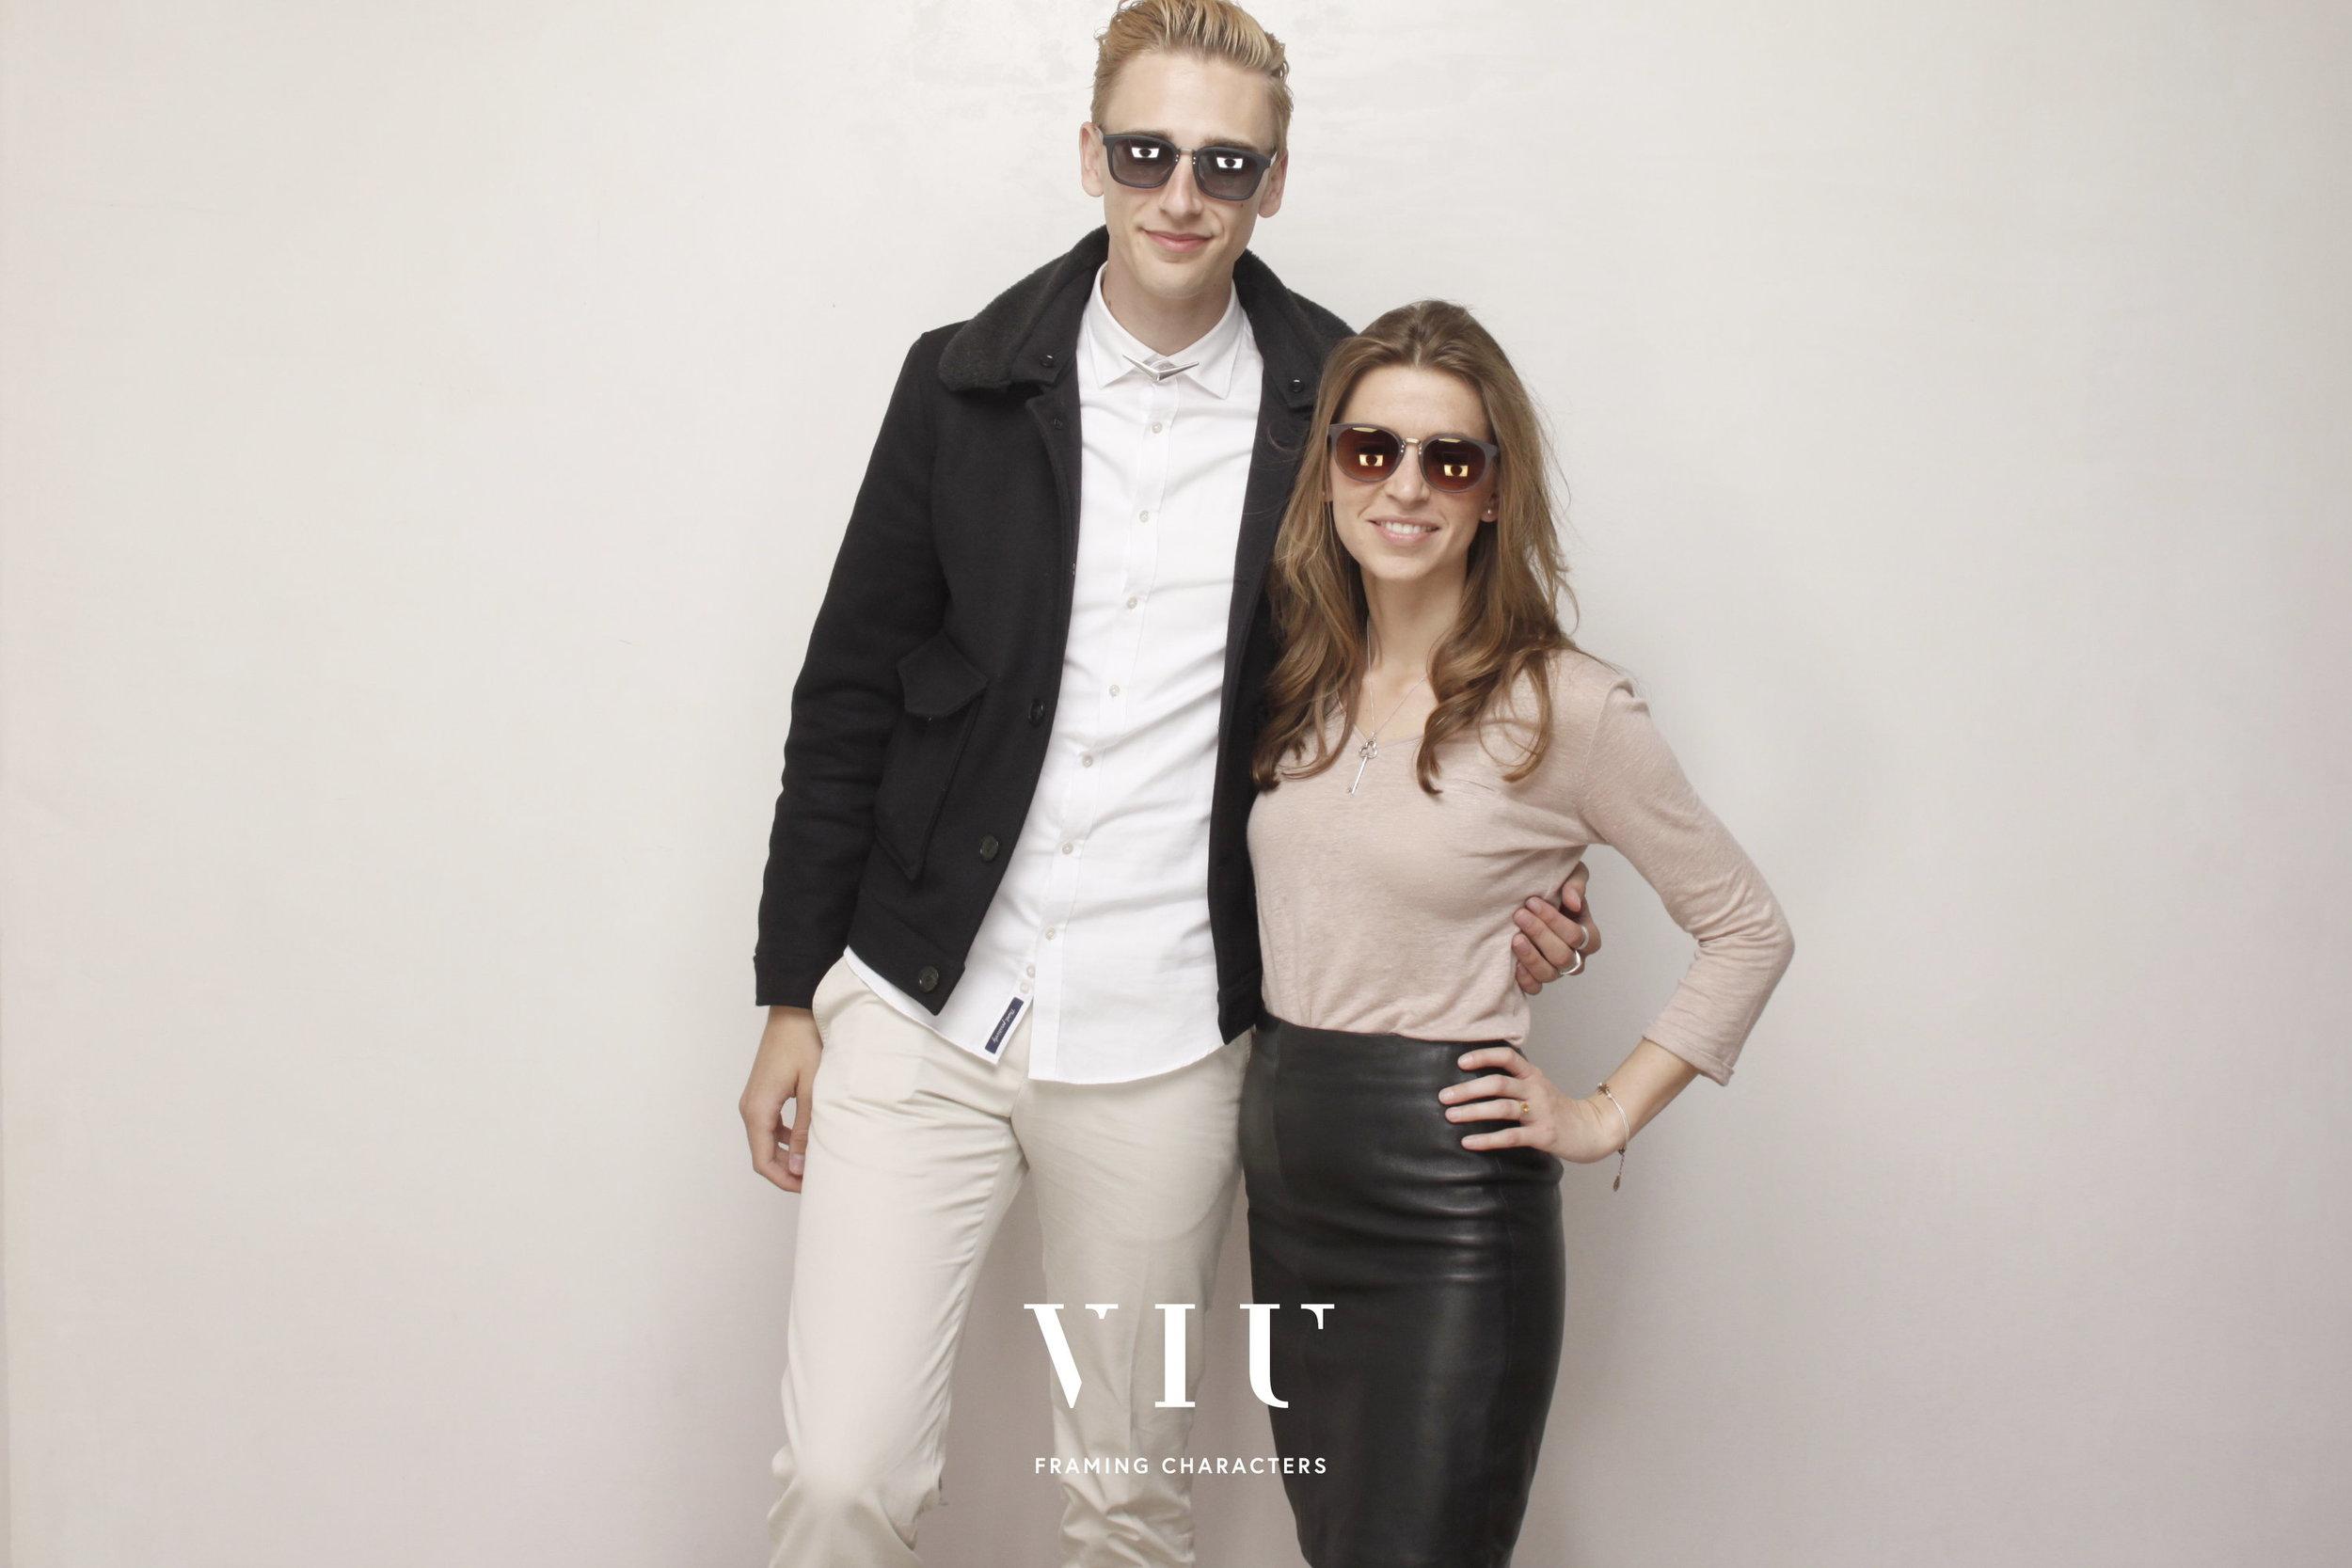 With Manon of VIU, both wearing S/S 2014 sunglasses. Photo © www.egoshooting.com.